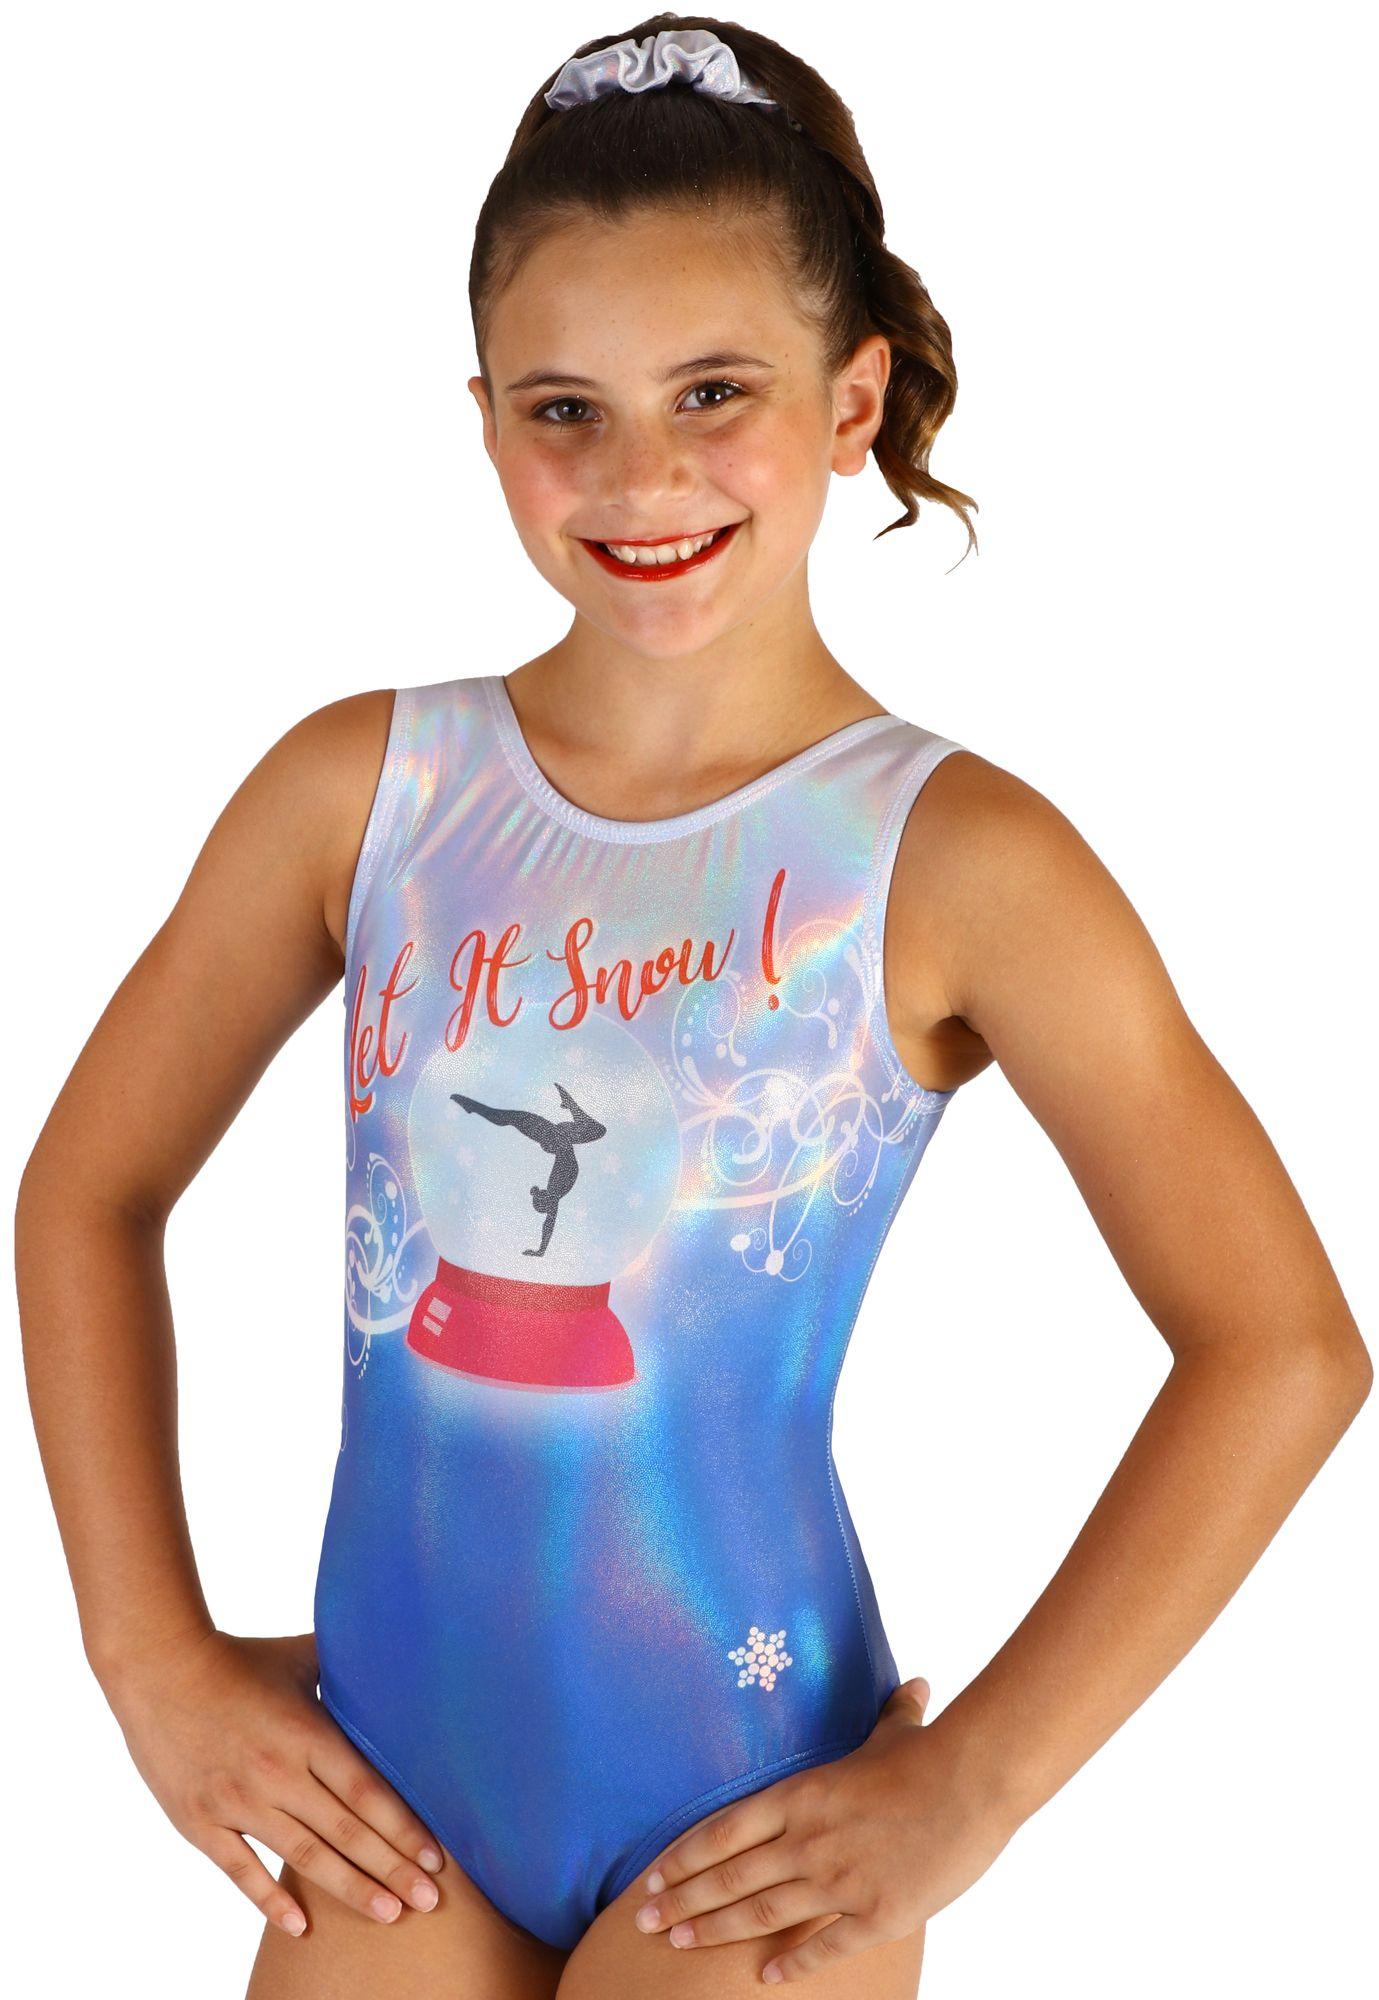 Joyful Gymnastics Leotard by Snowflake Designs NEW